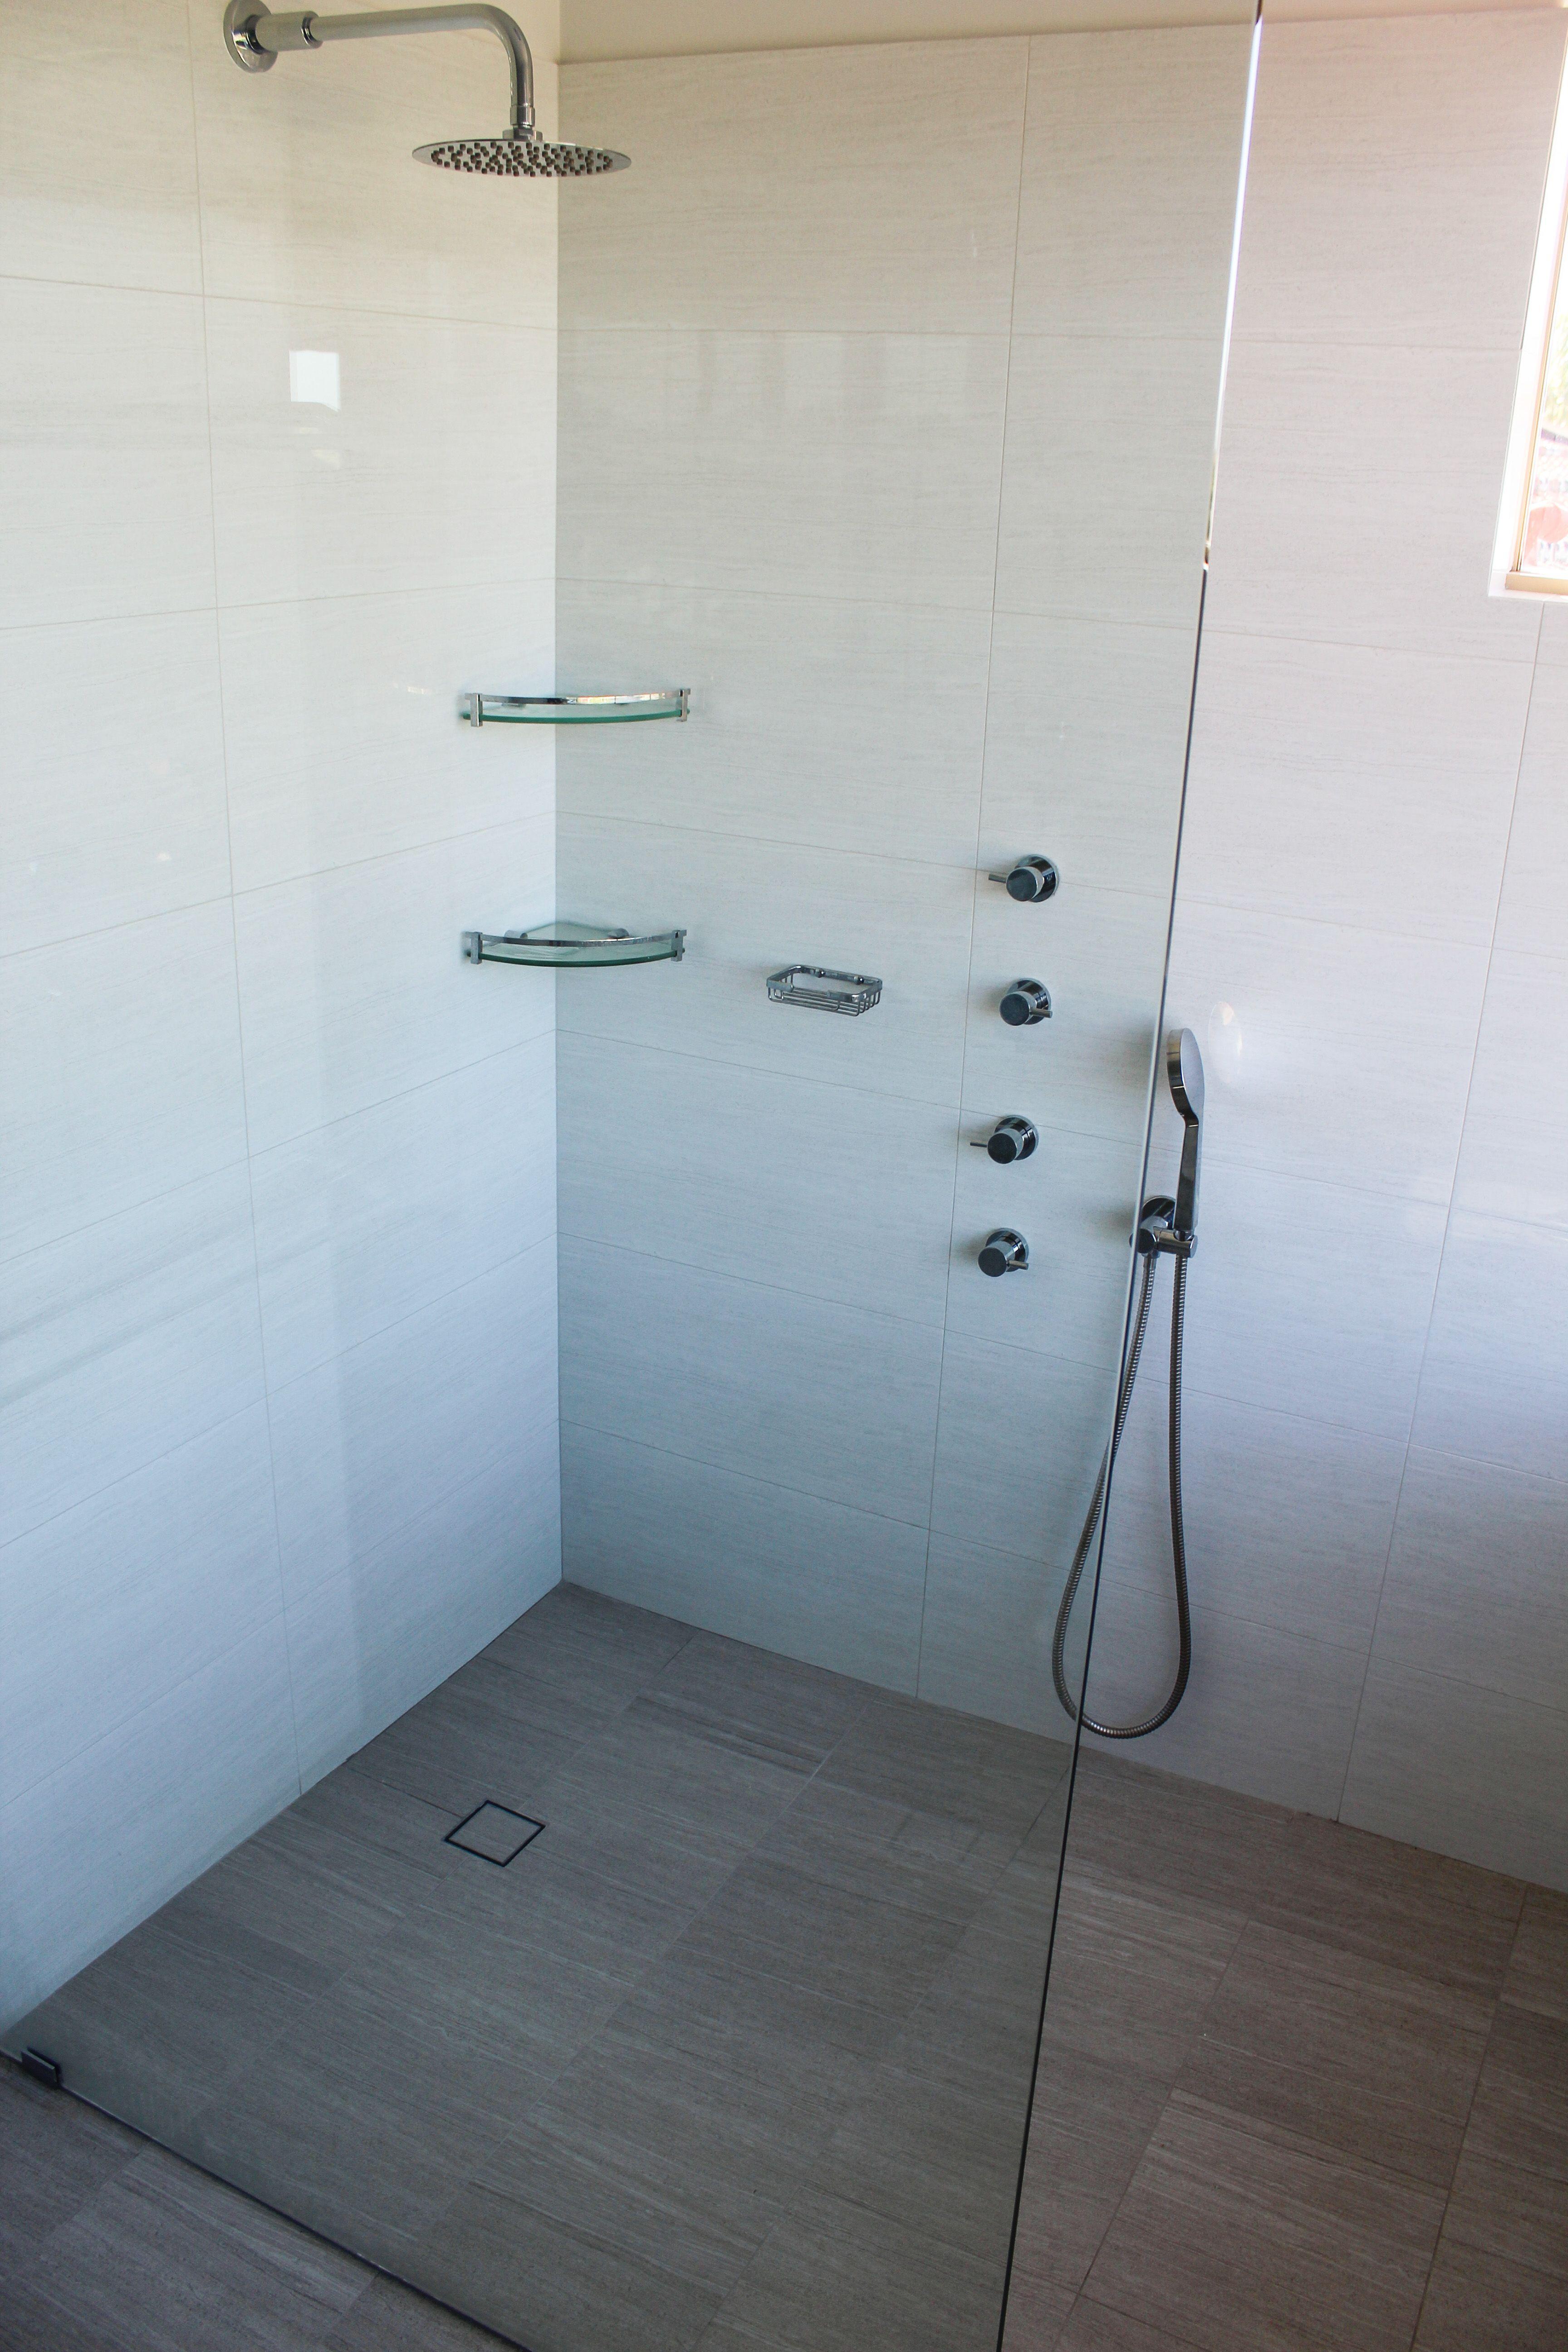 Open Shower - Frameless Fixed Panel - Walk In Shower - Large Walk In ...